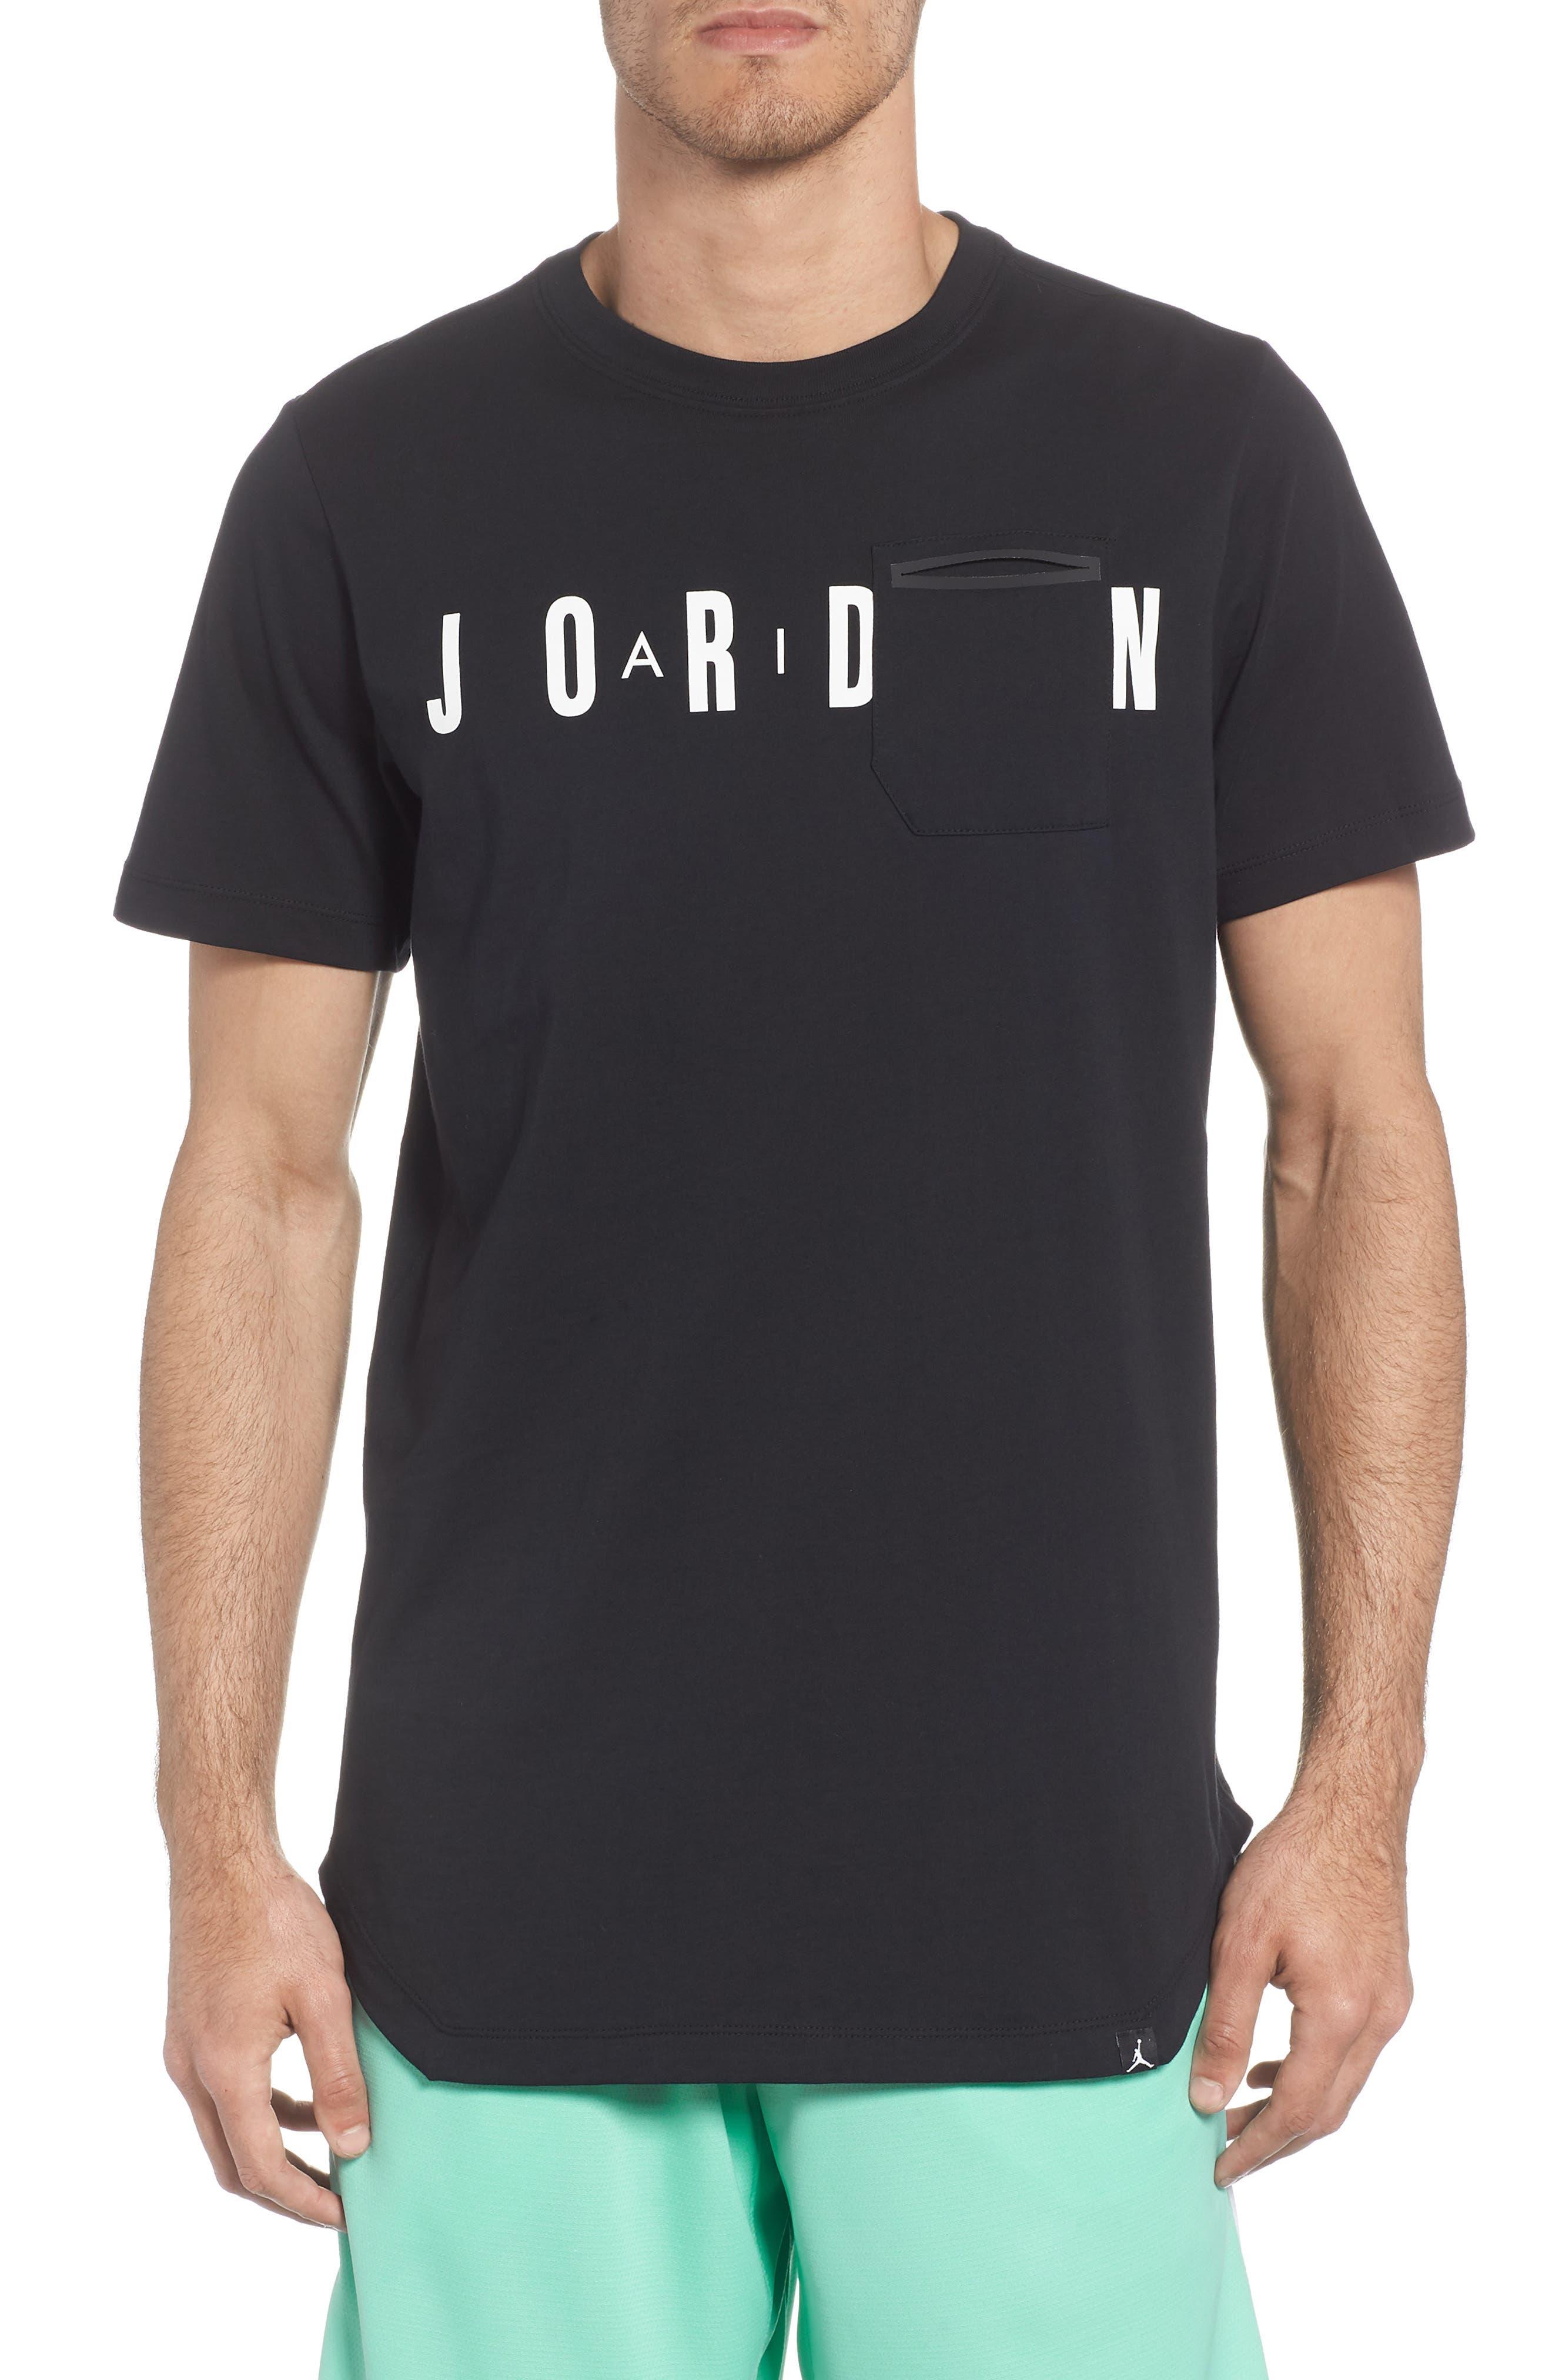 Jordan Sportswear Graphic Shirt, Black